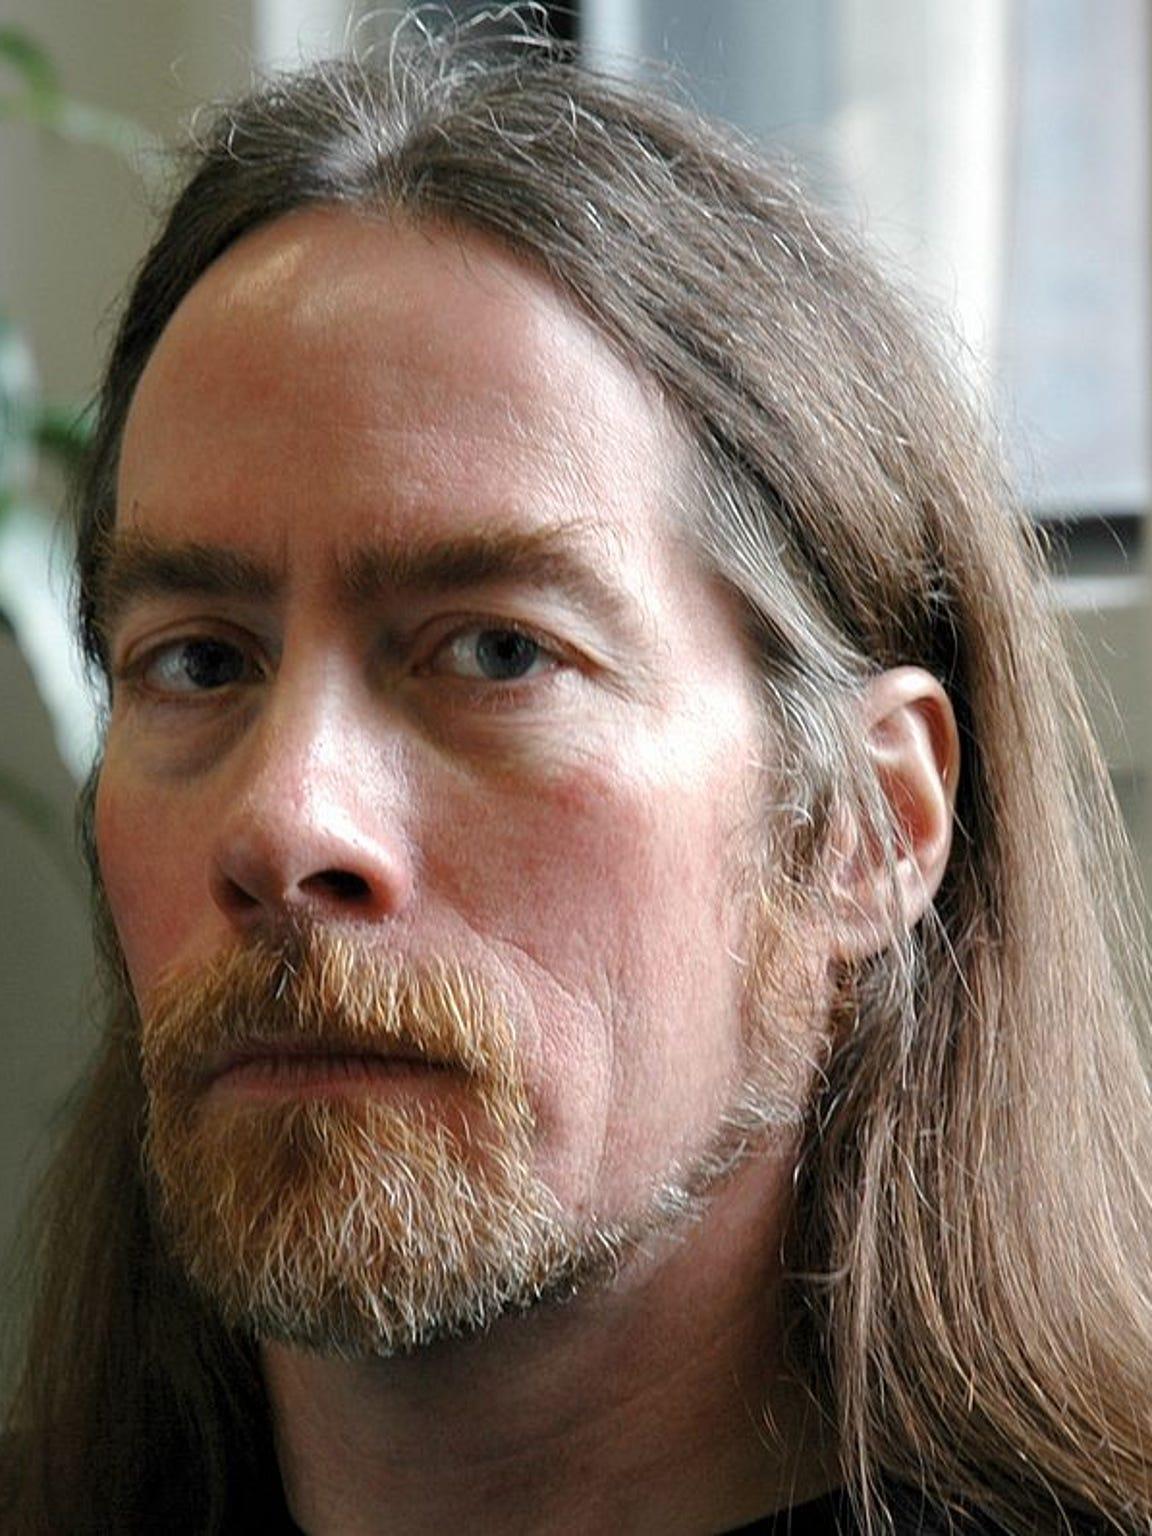 Criminologist David M. Kennedy